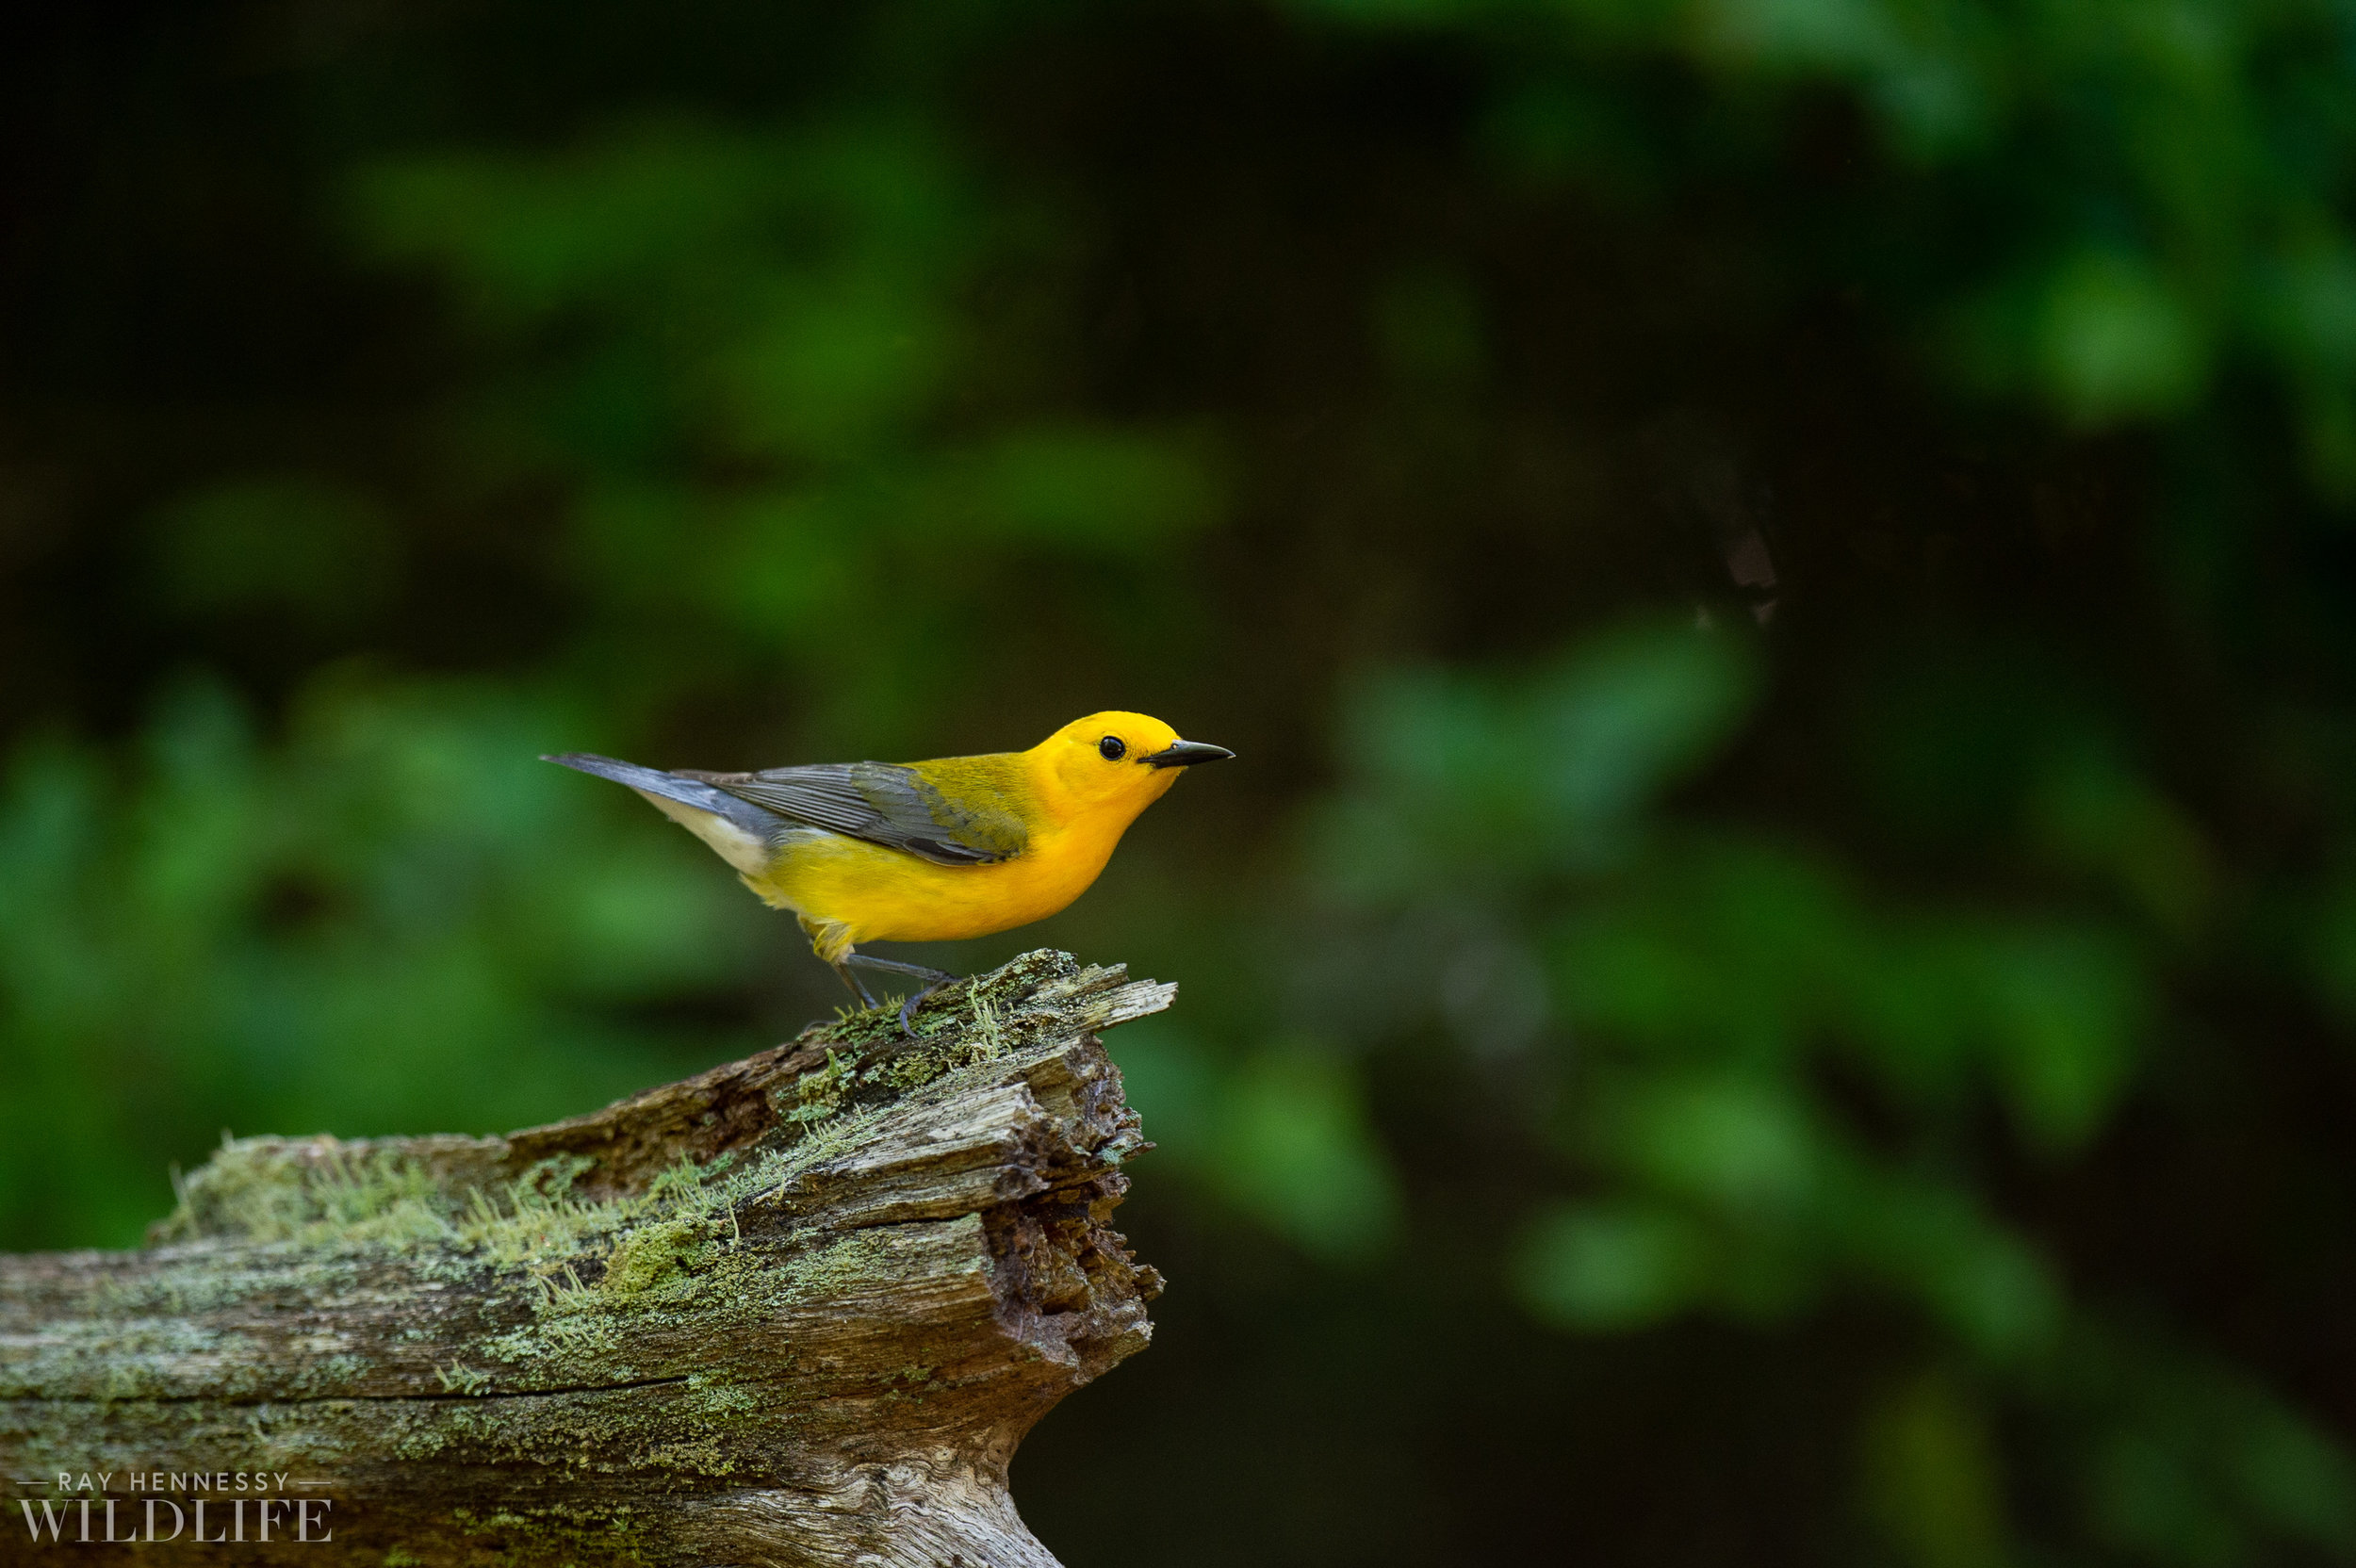 020_shorebirds-prothonotary-warbler.jpg